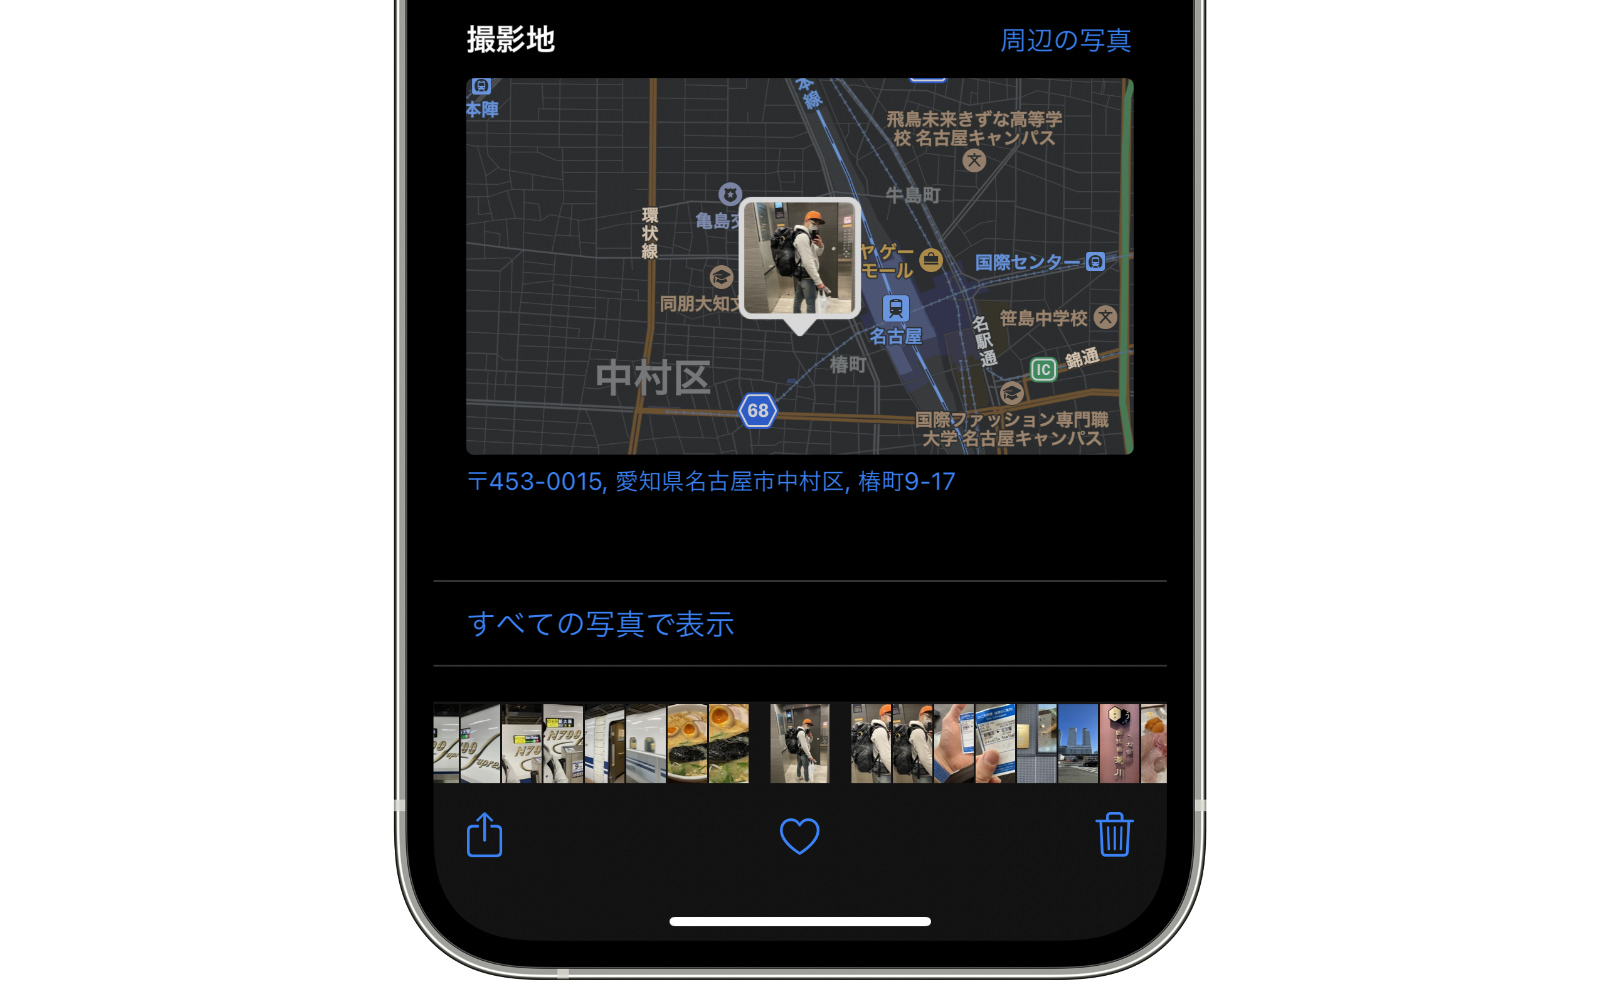 Ios14 photo app meta data